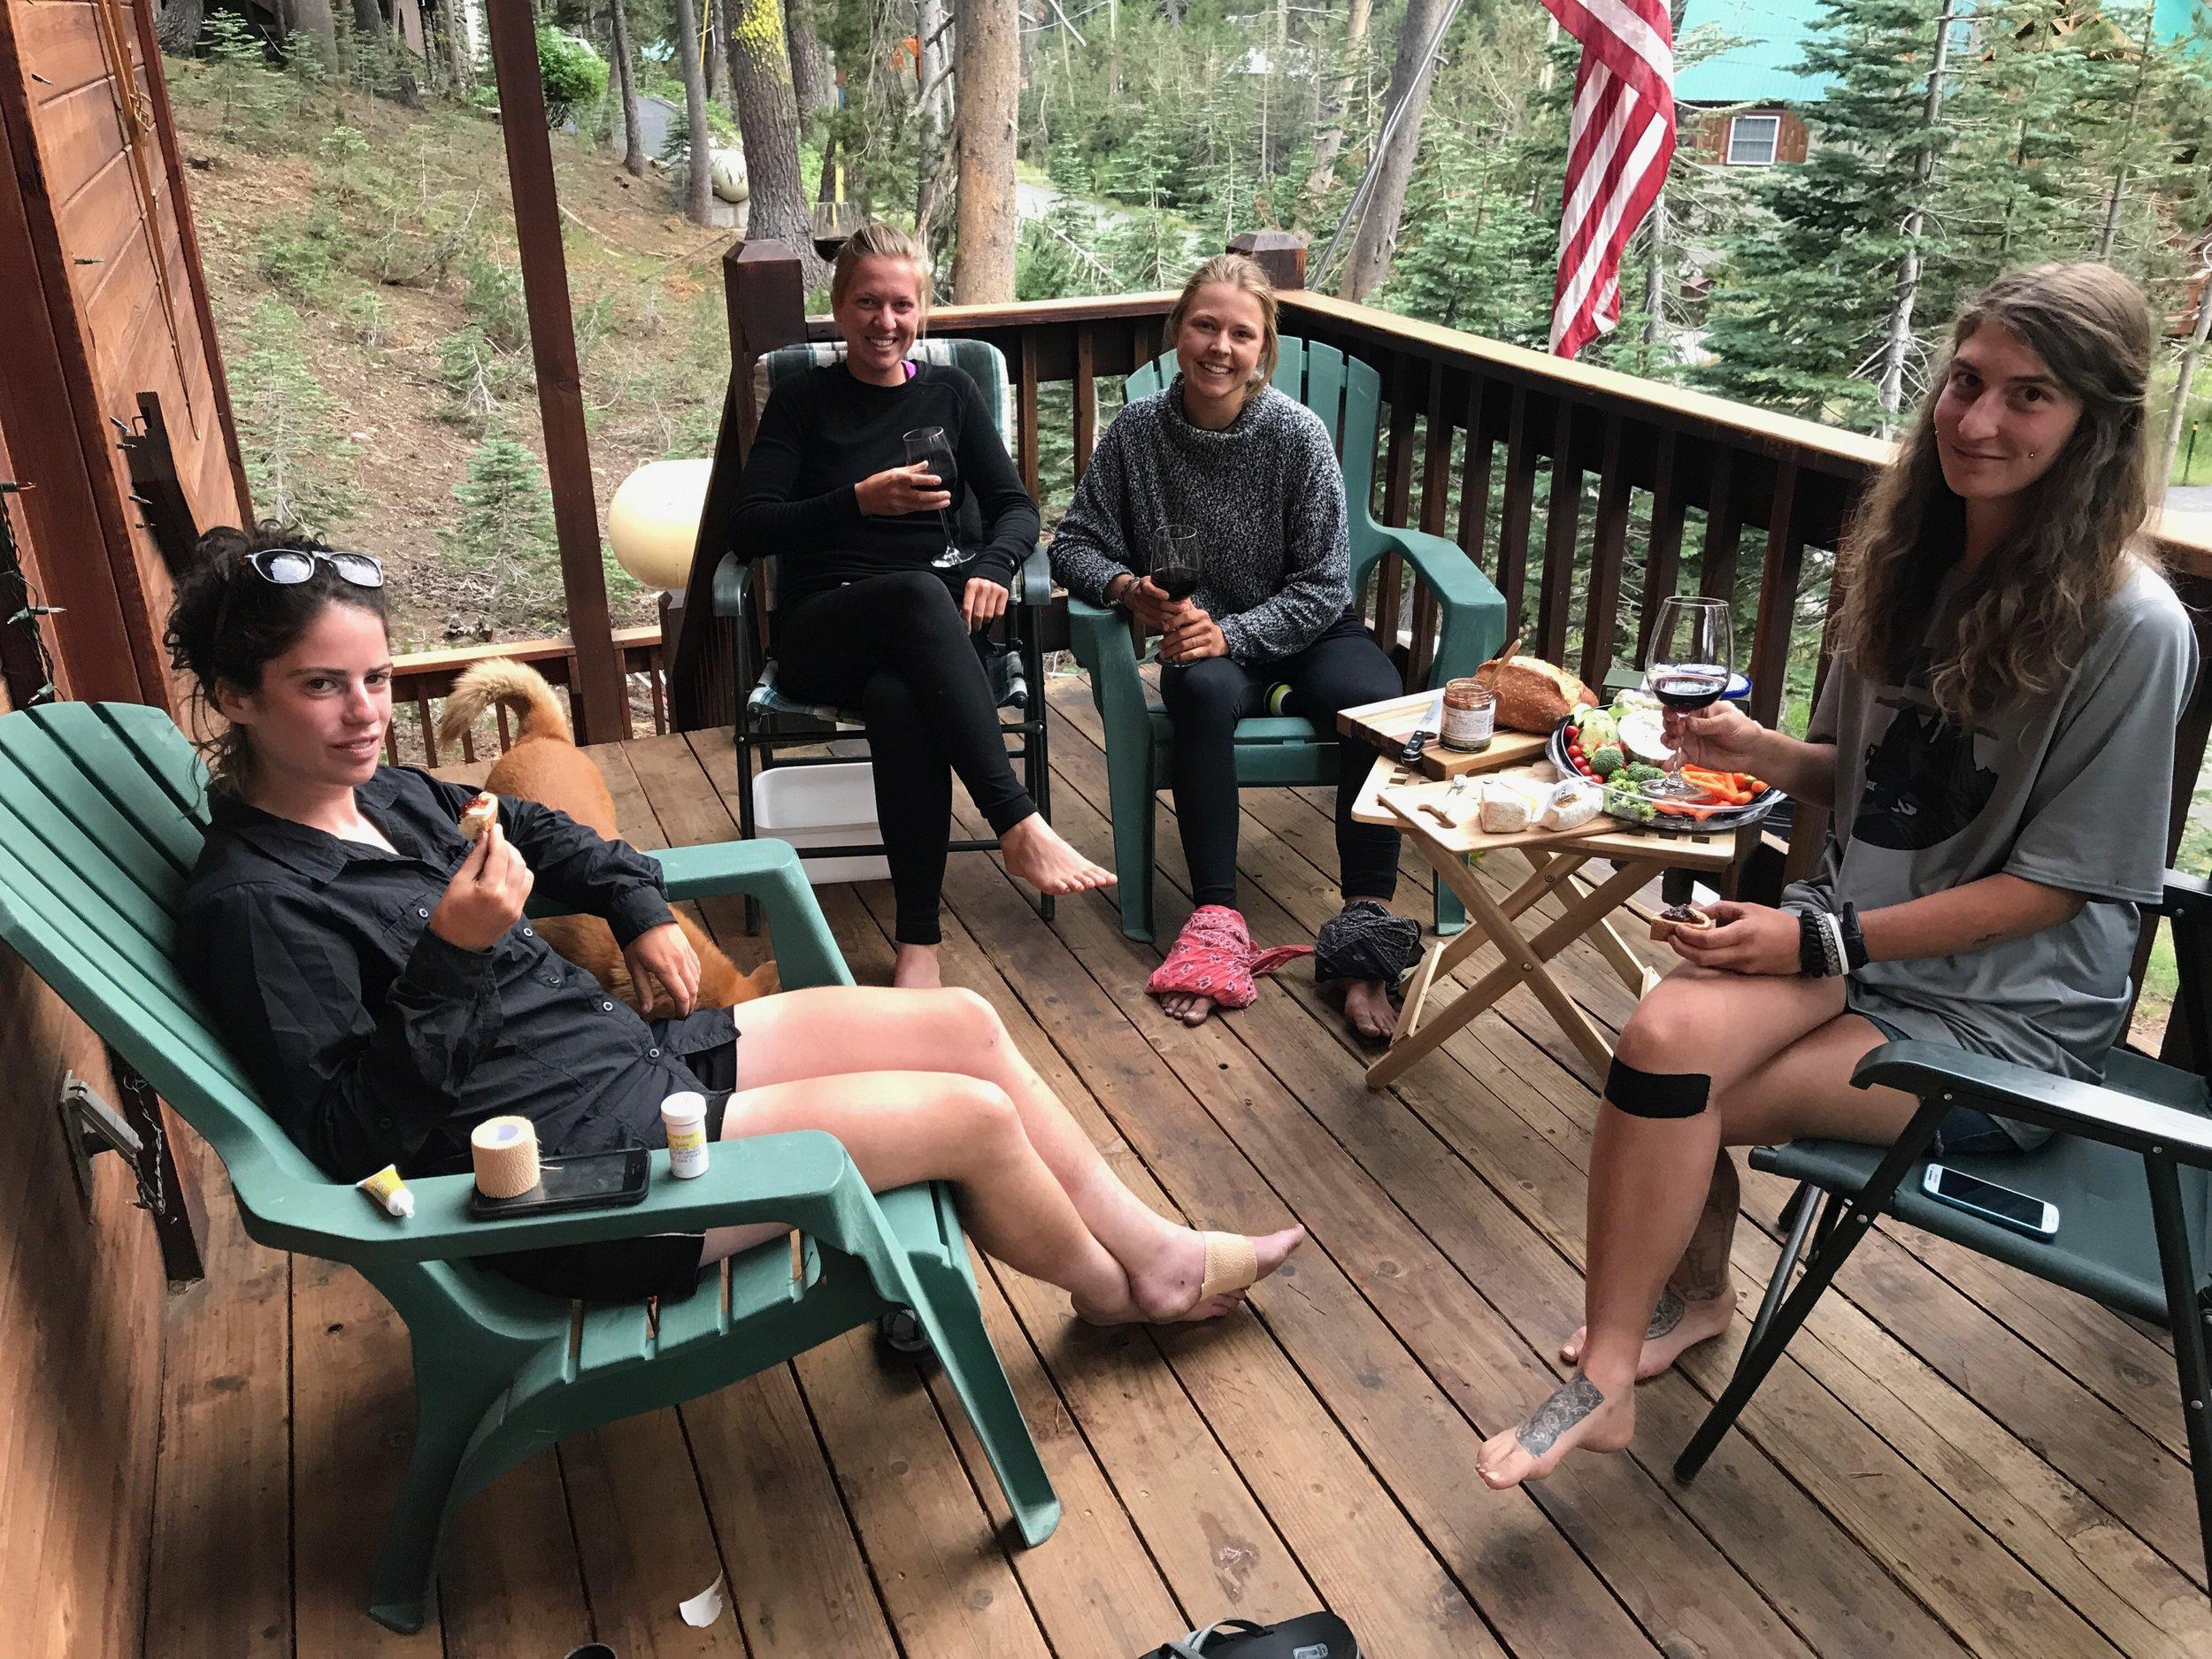 Wine night with Sara, Jade and Val. Sara gets antibiotics instead of wine